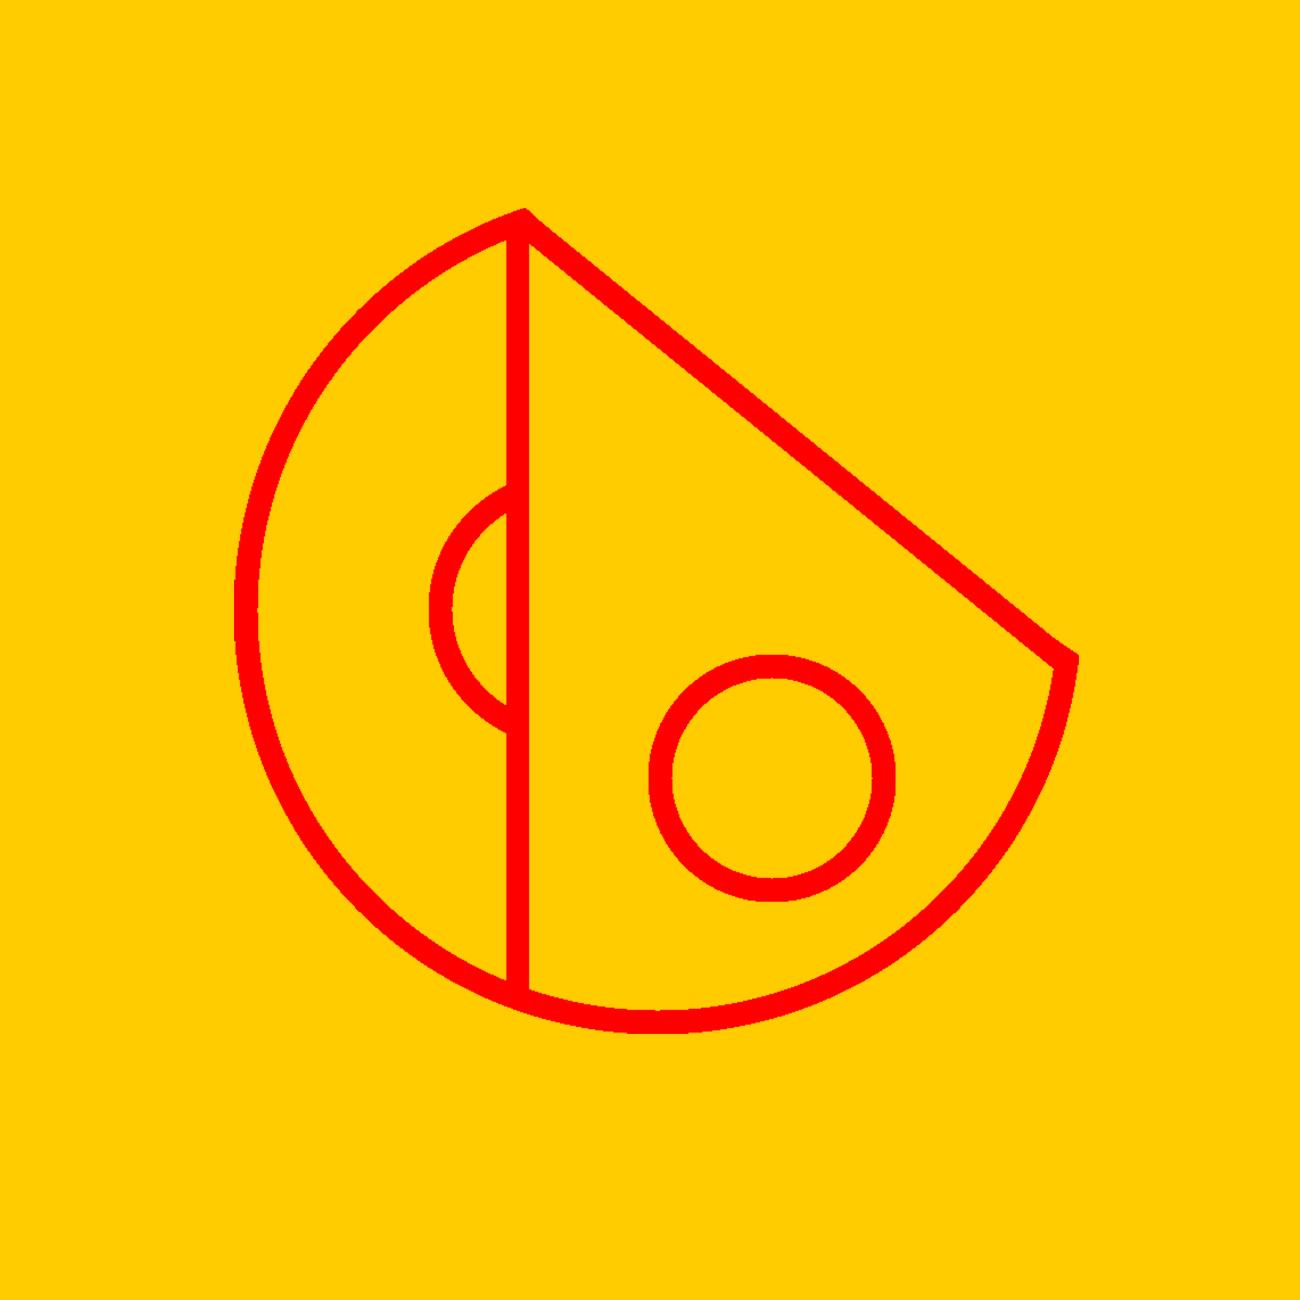 AC_red_yellow.jpg